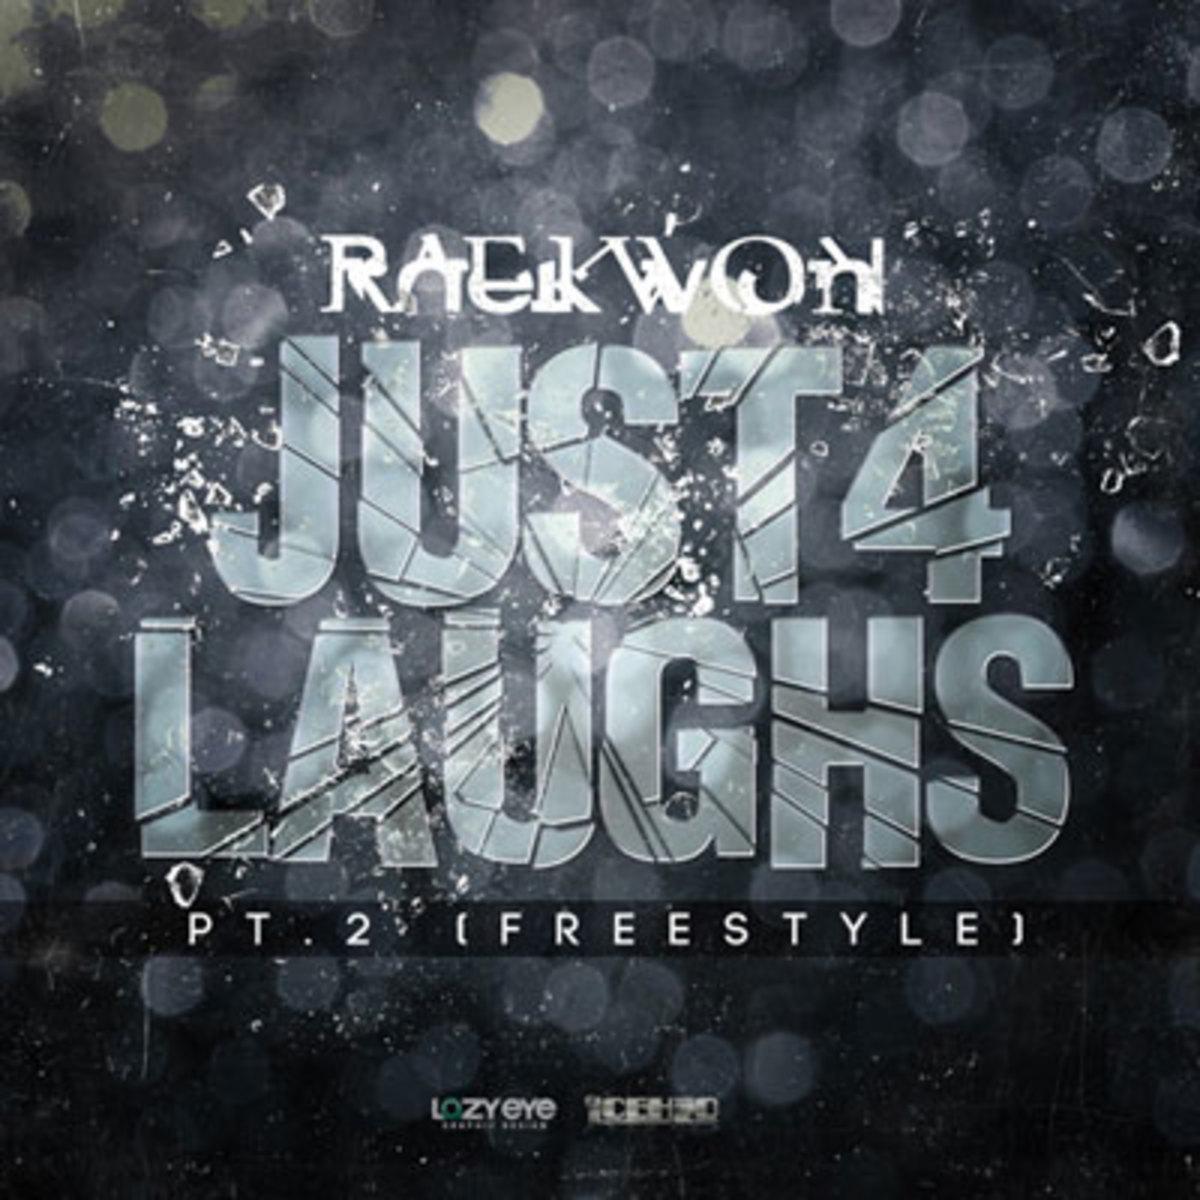 raekwon-justforlaughs2.jpg